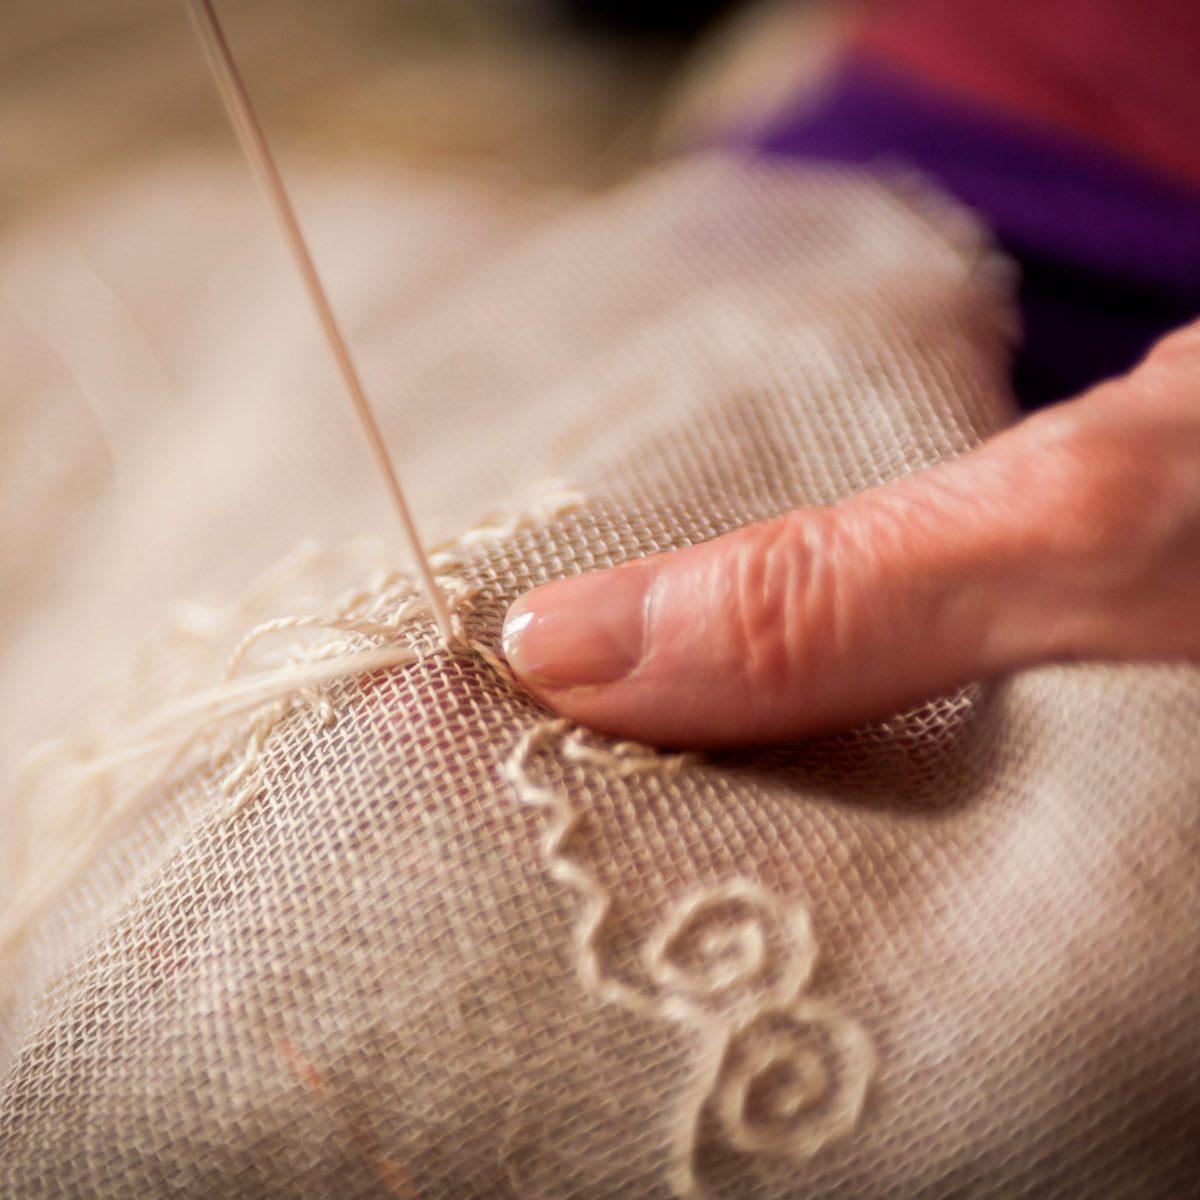 Woman sews on burlap